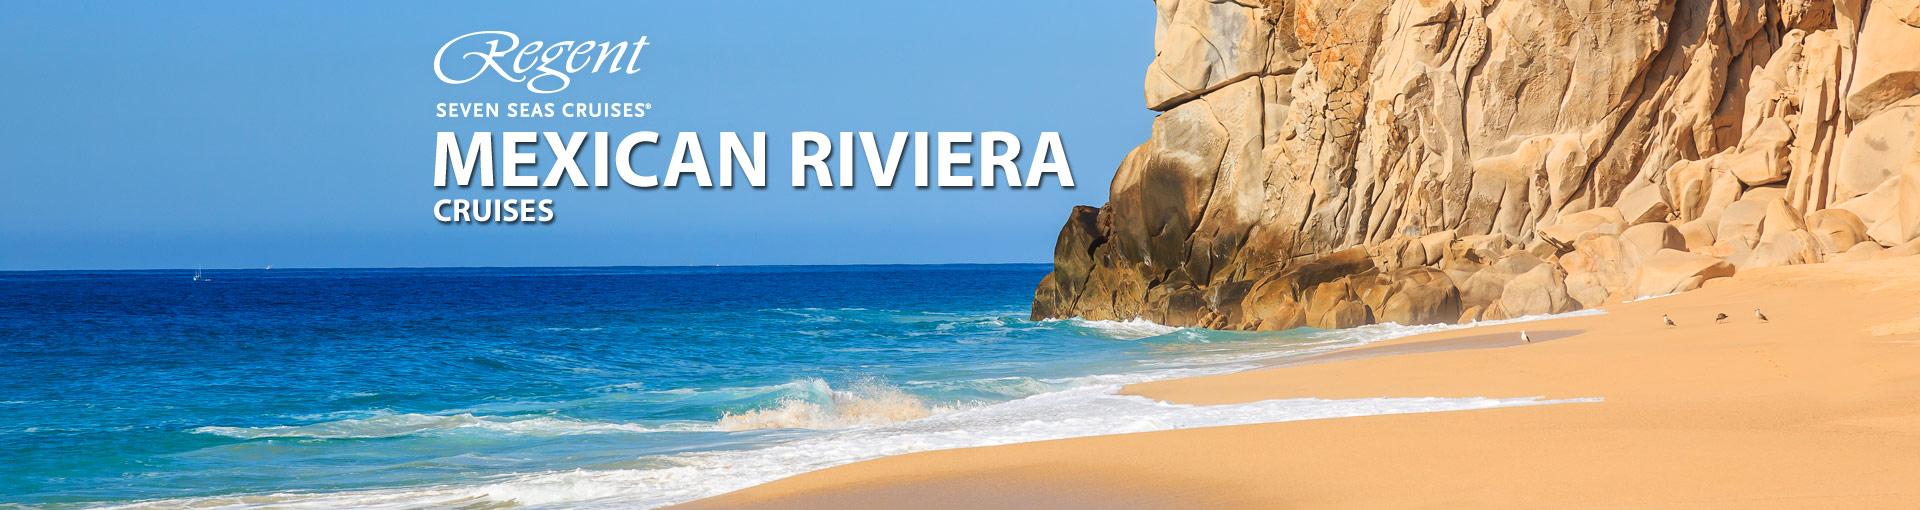 Regent Seven Seas Mexican Riviera Cruises